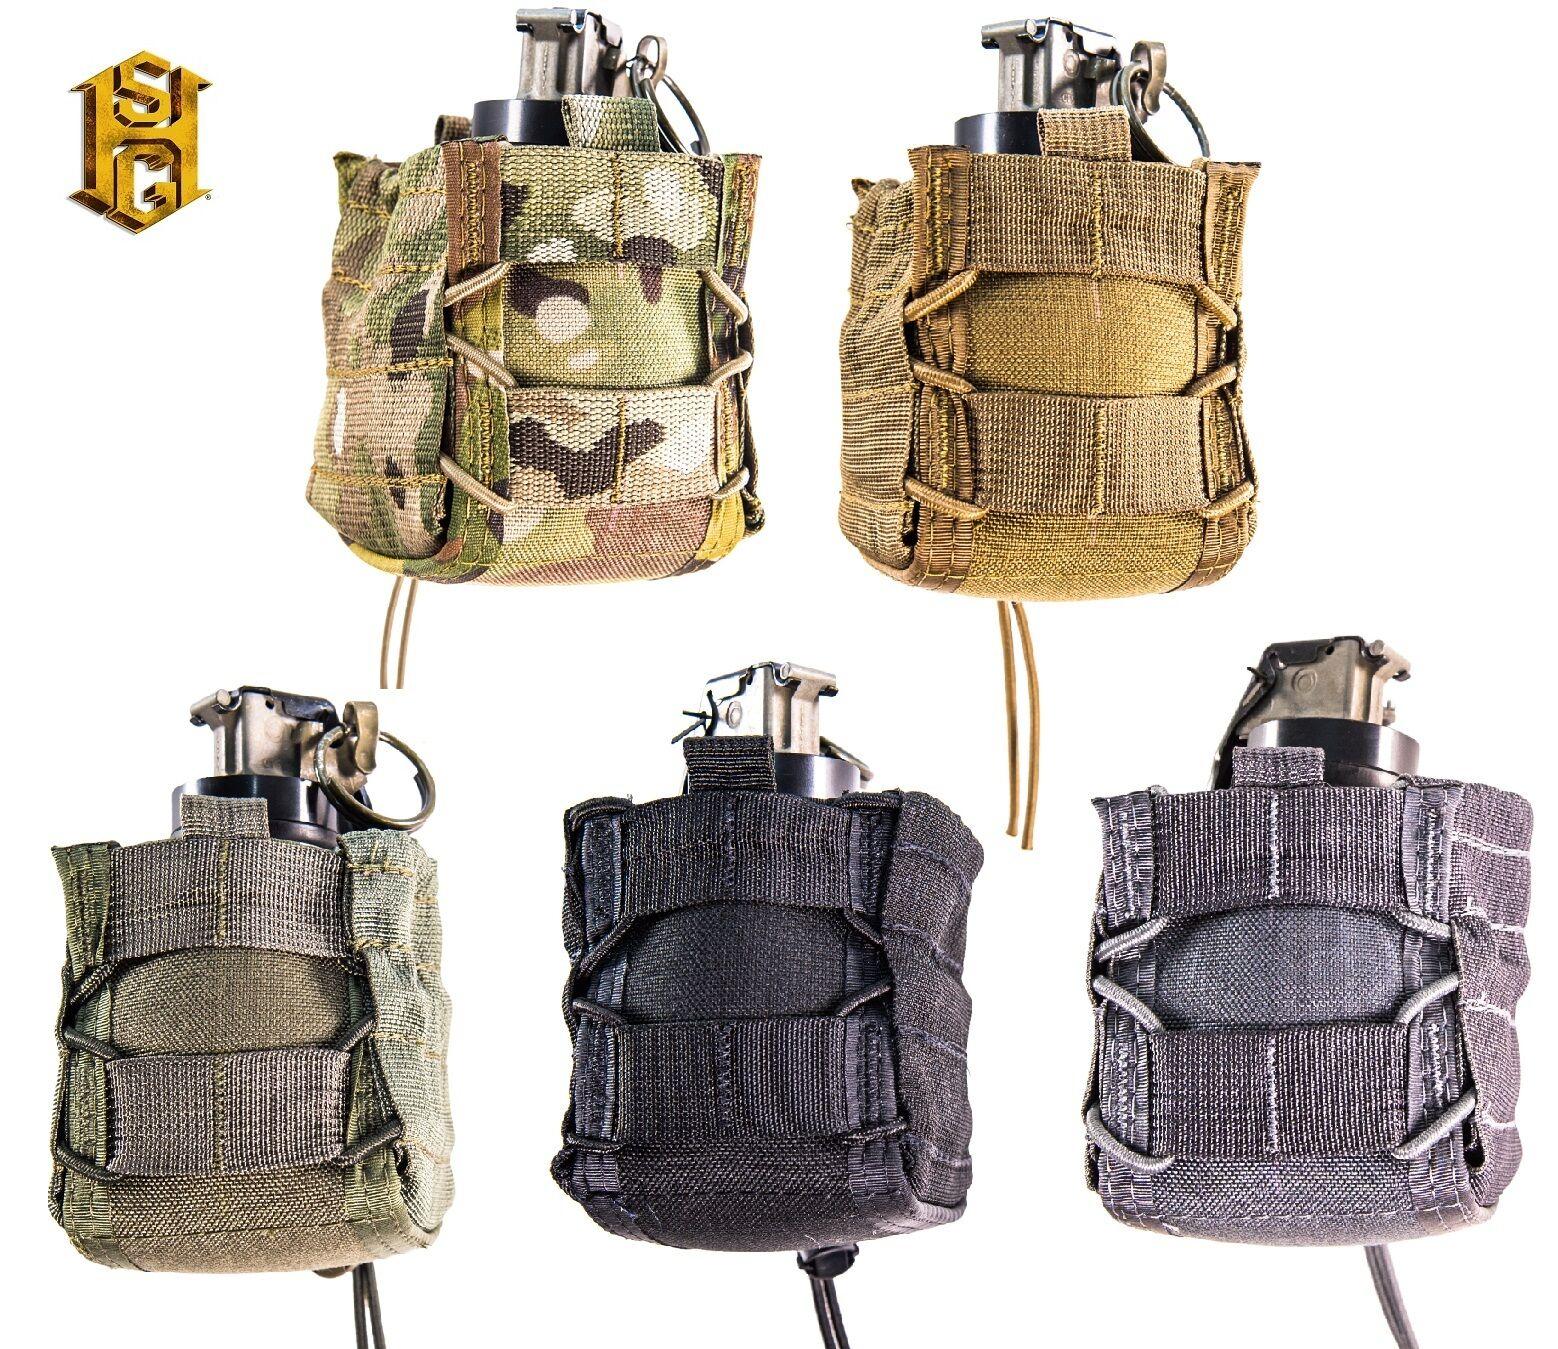 HSGI Stinger Grenade Pouch-12ST00-Choose Your color